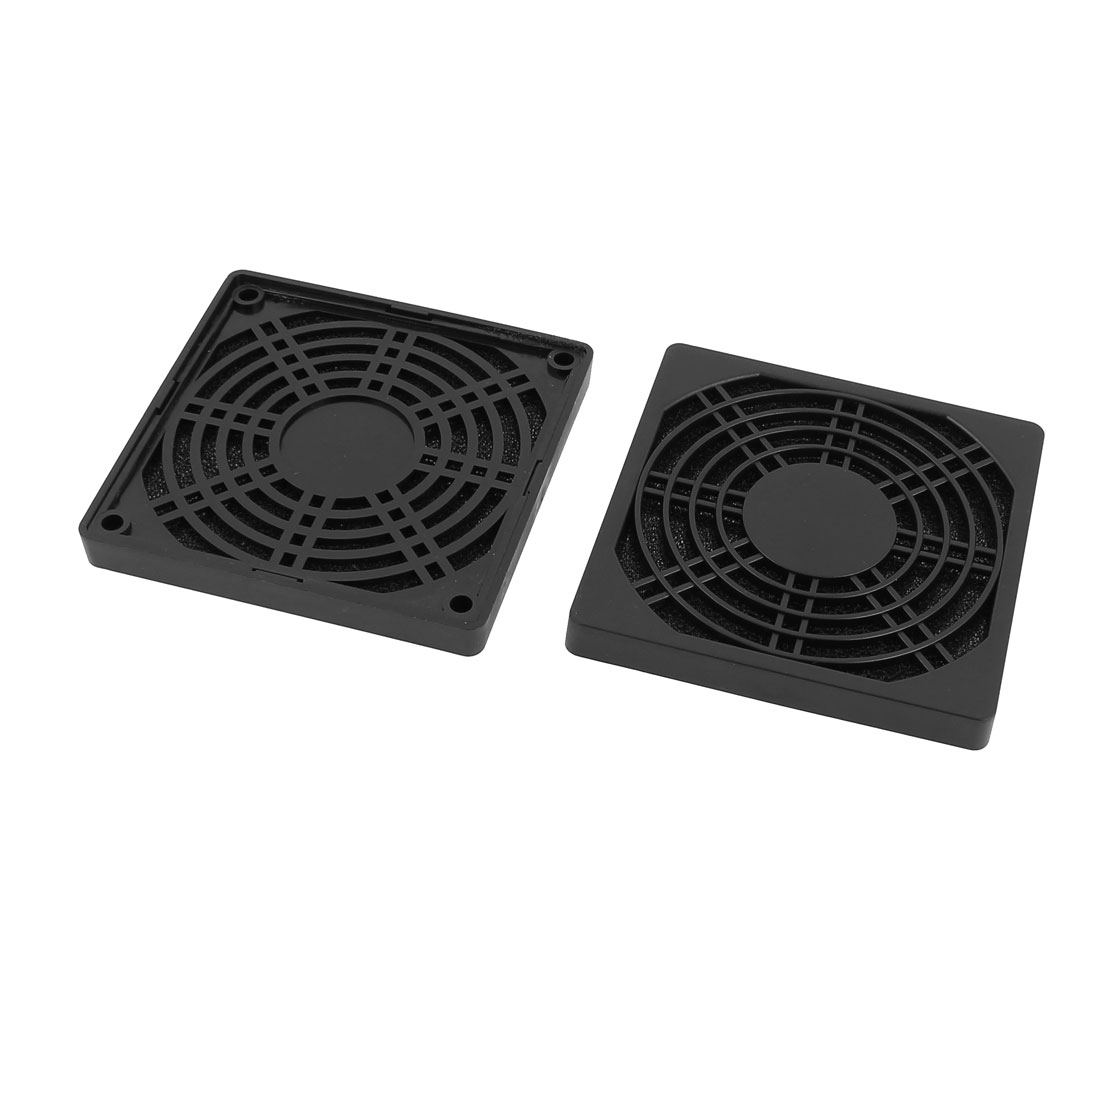 2Pcs Computer Case Fan Dustproof Mesh Filter Dust Guard 96mmx96mmx10mm